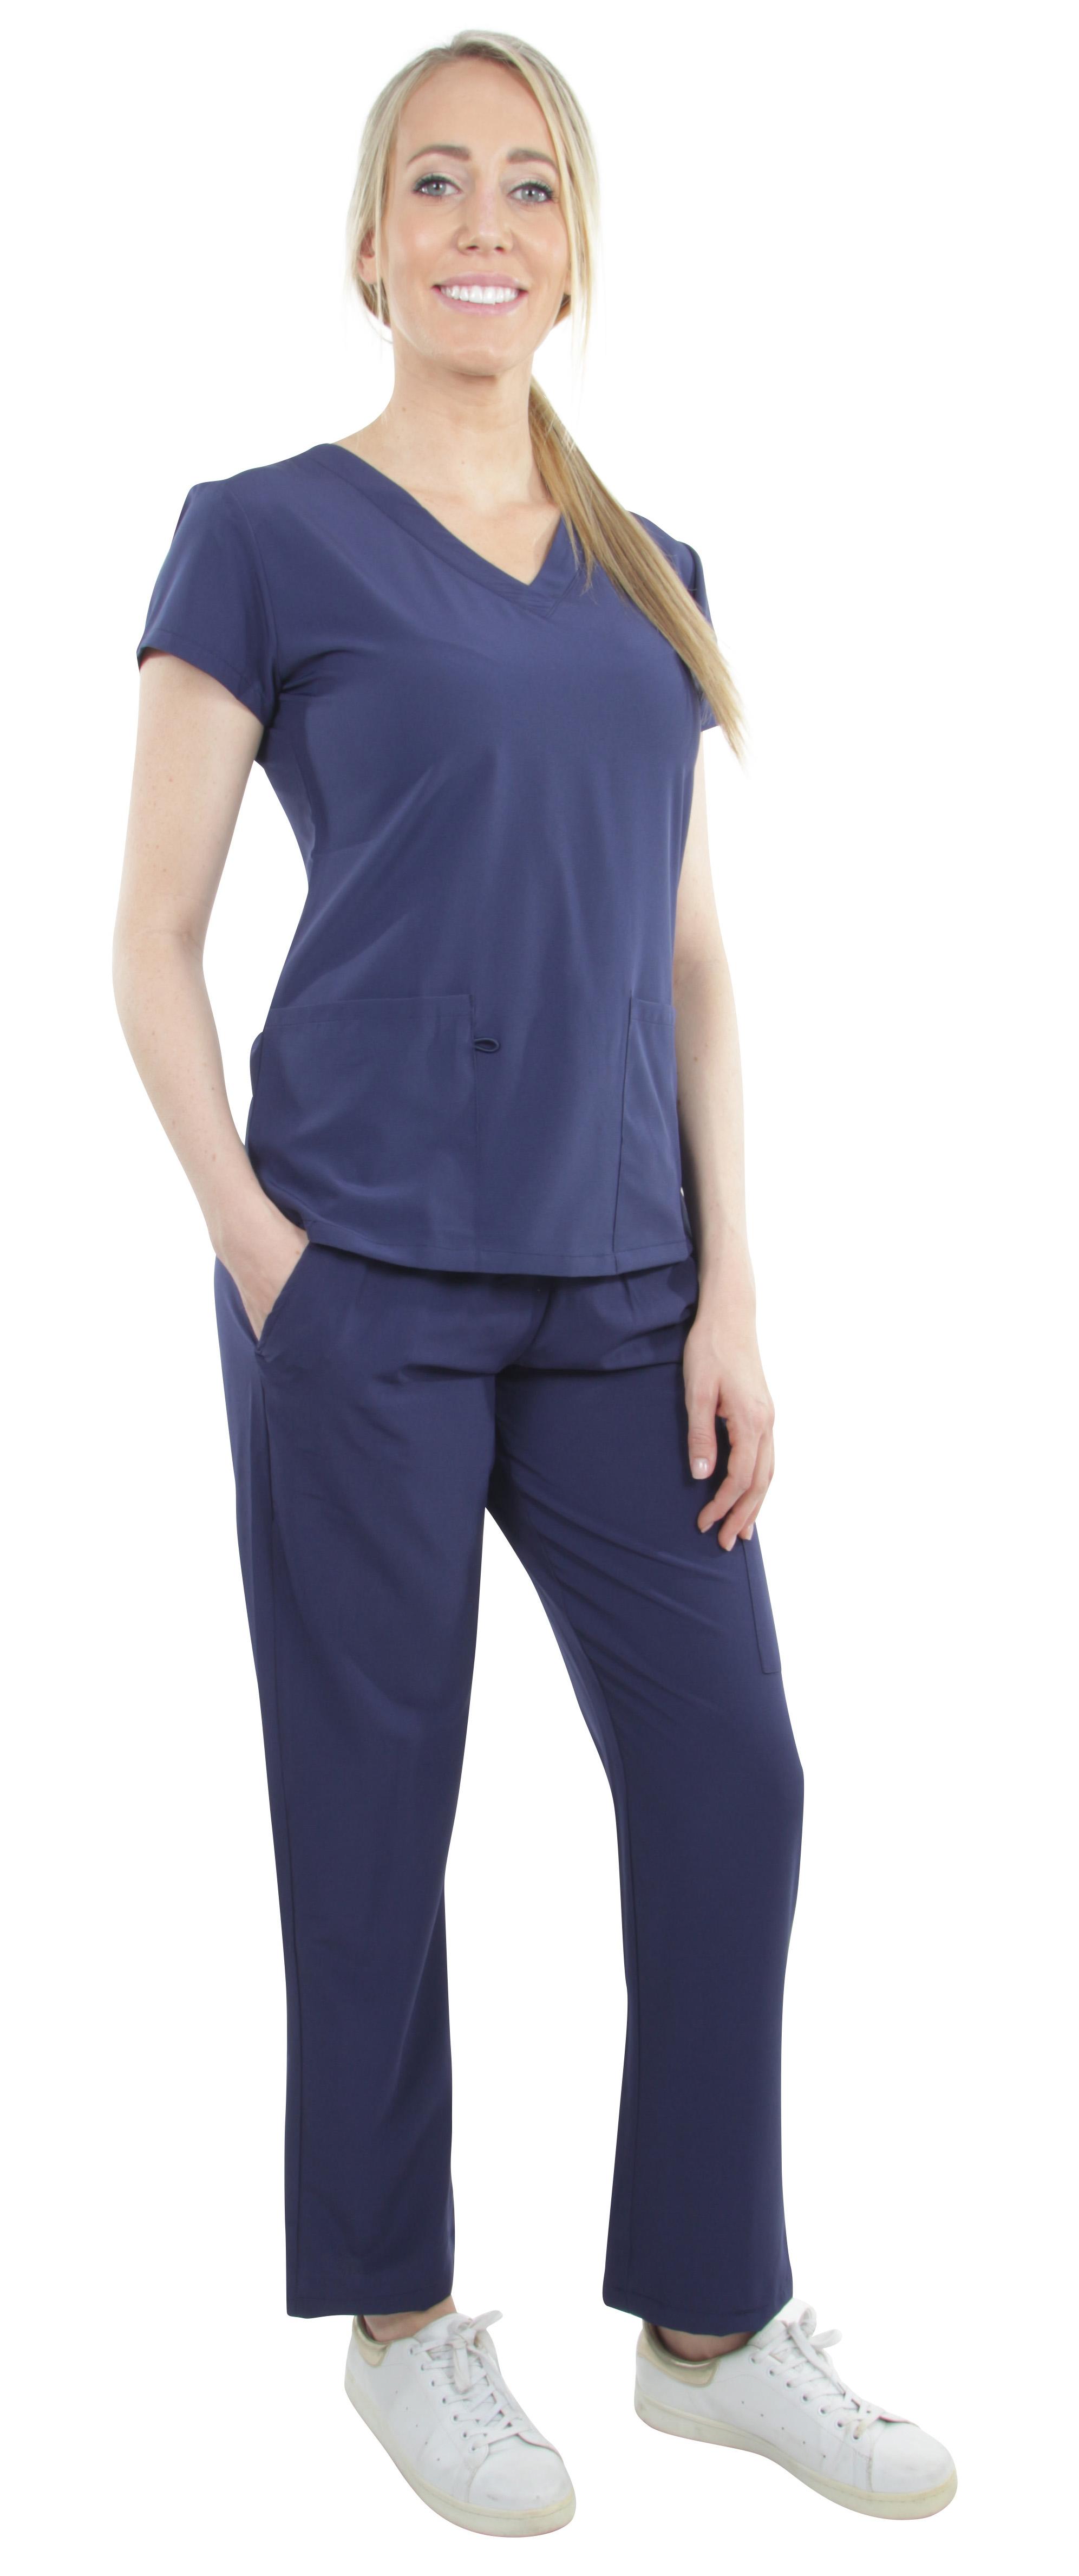 Unisex-Performance-Stretch-Medical-Uniform-Five-Pockets-V-Neck-Scrubs-Sets miniature 36